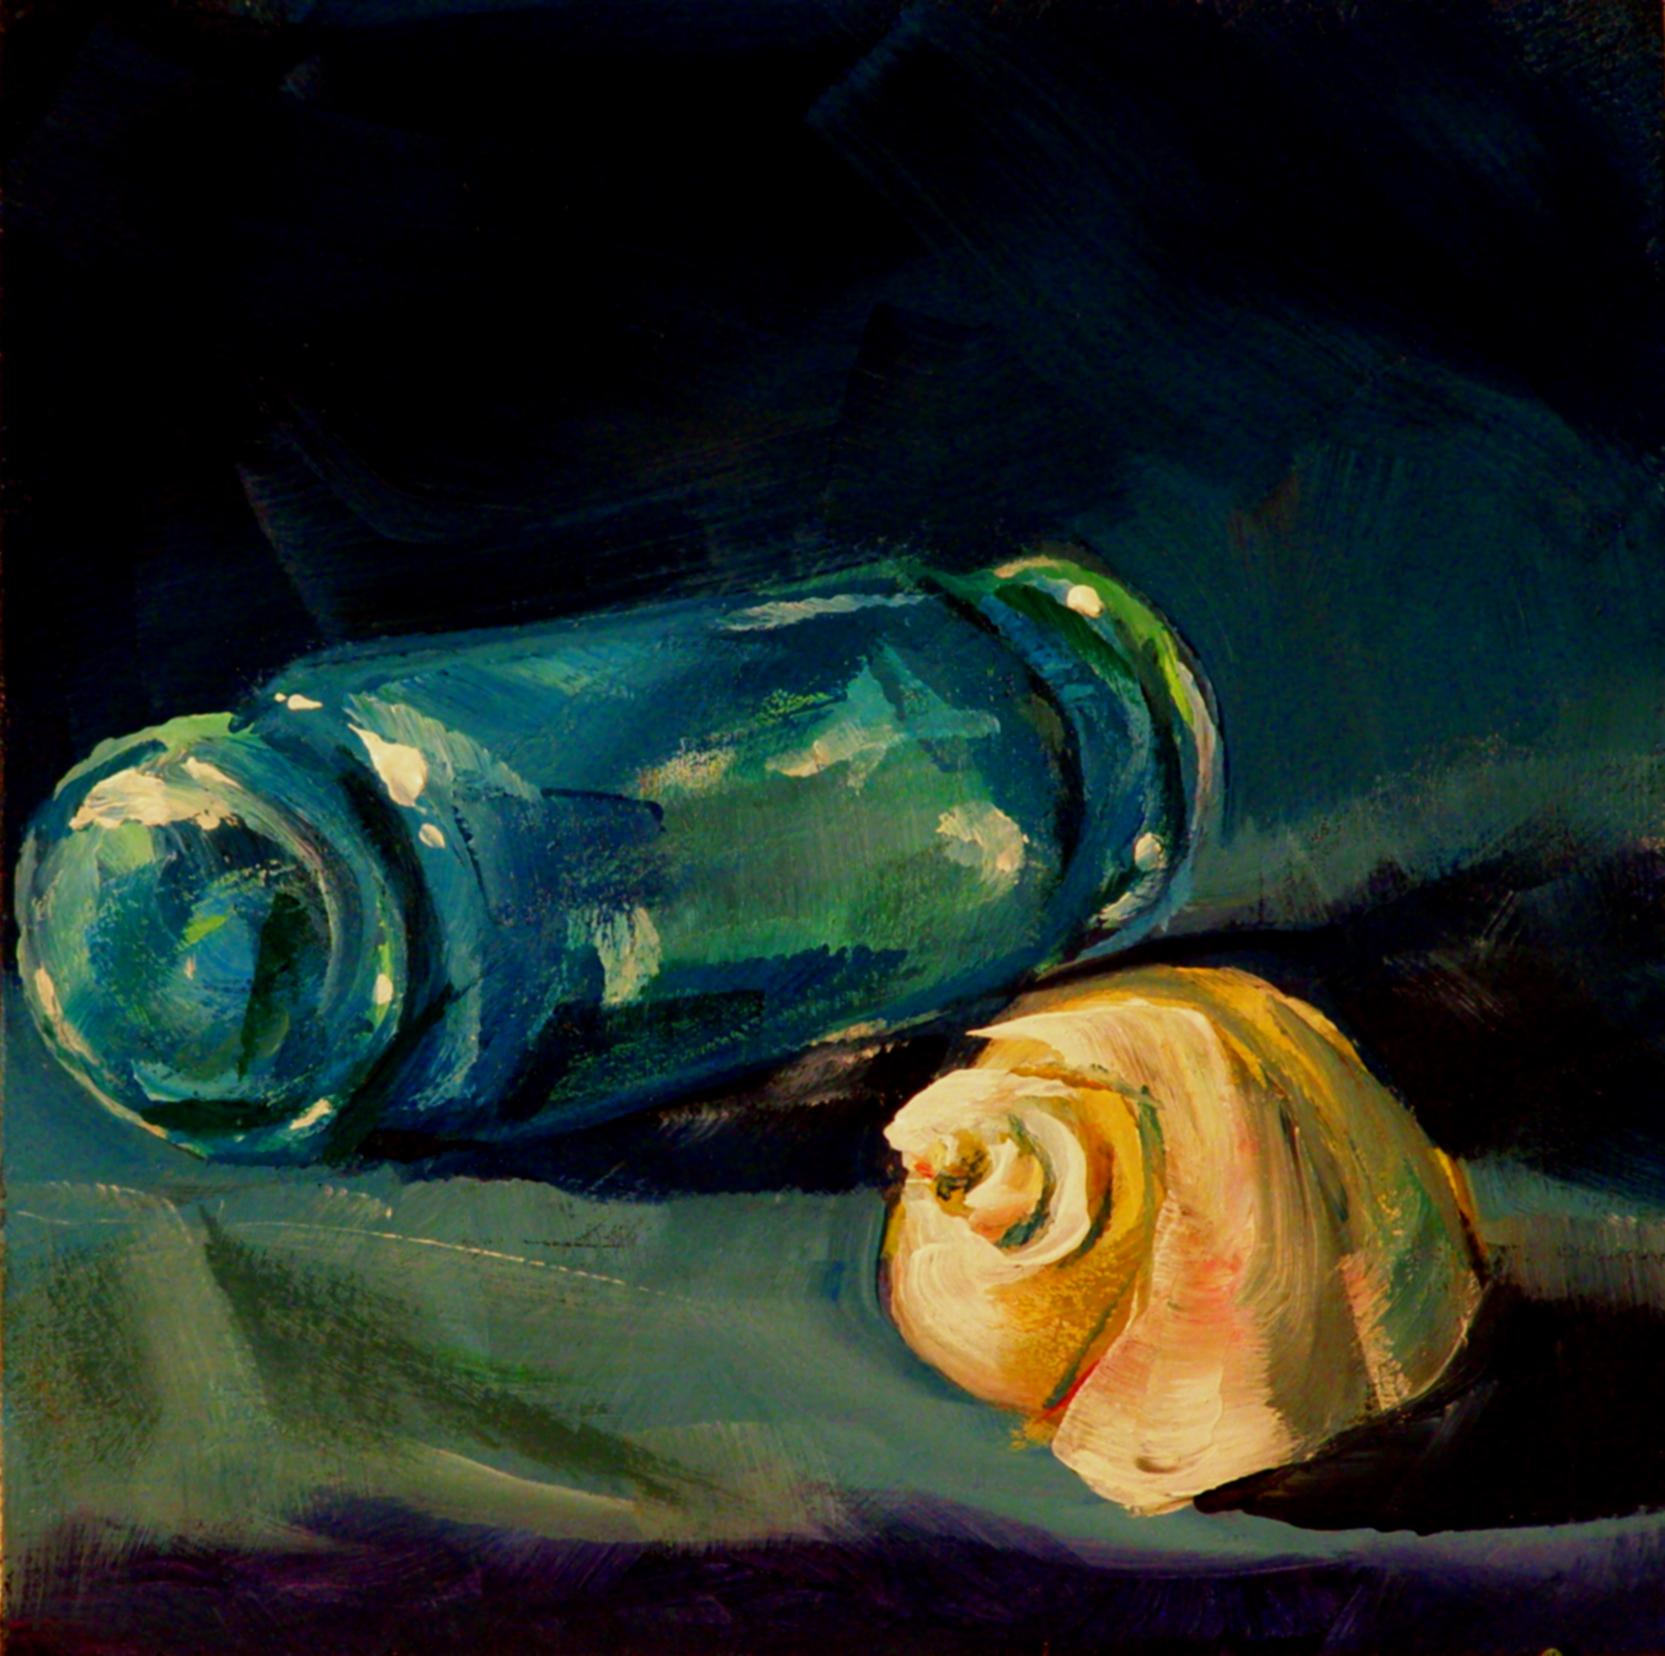 """GLASS FLOAT"" original fine art by Brian Cameron"